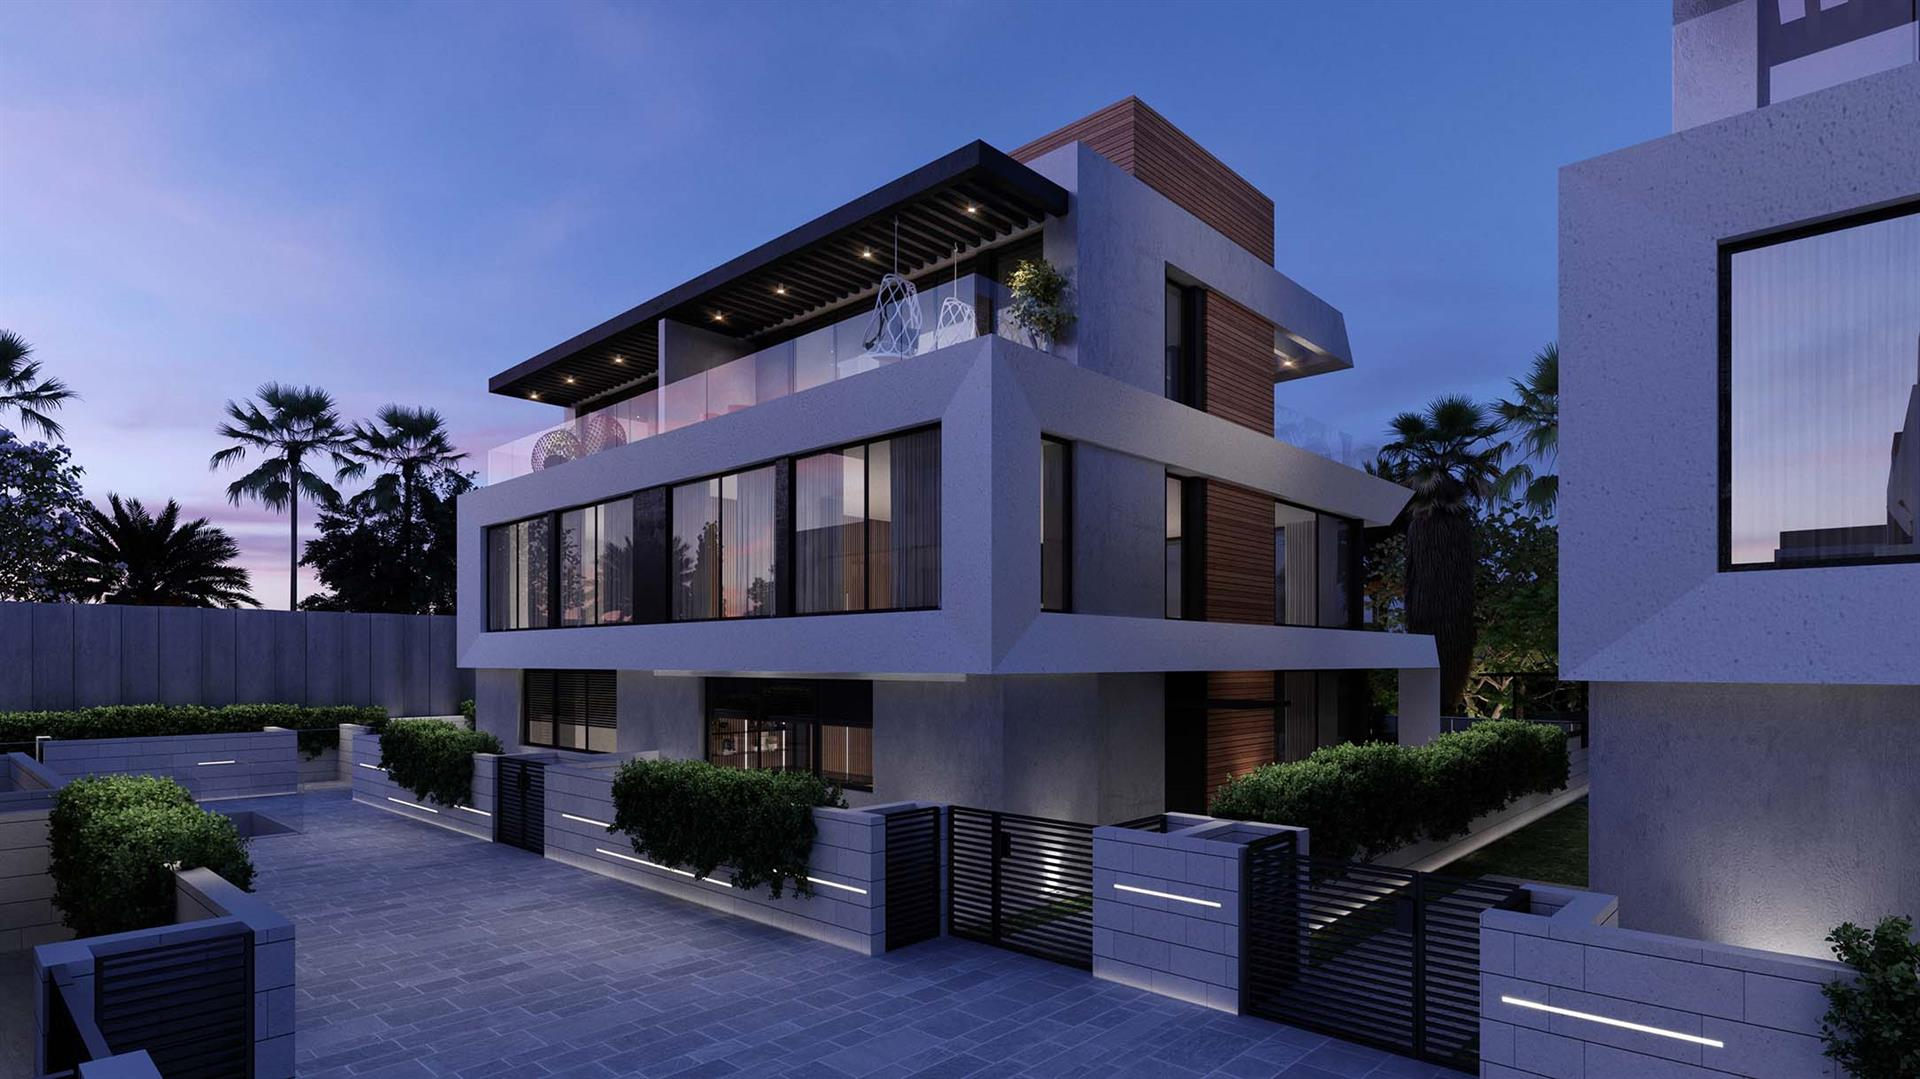 'Semi-Detached House' building or community at 'Project 26 Refidim 26 Tel Aviv, Israel 6998257 Israel'